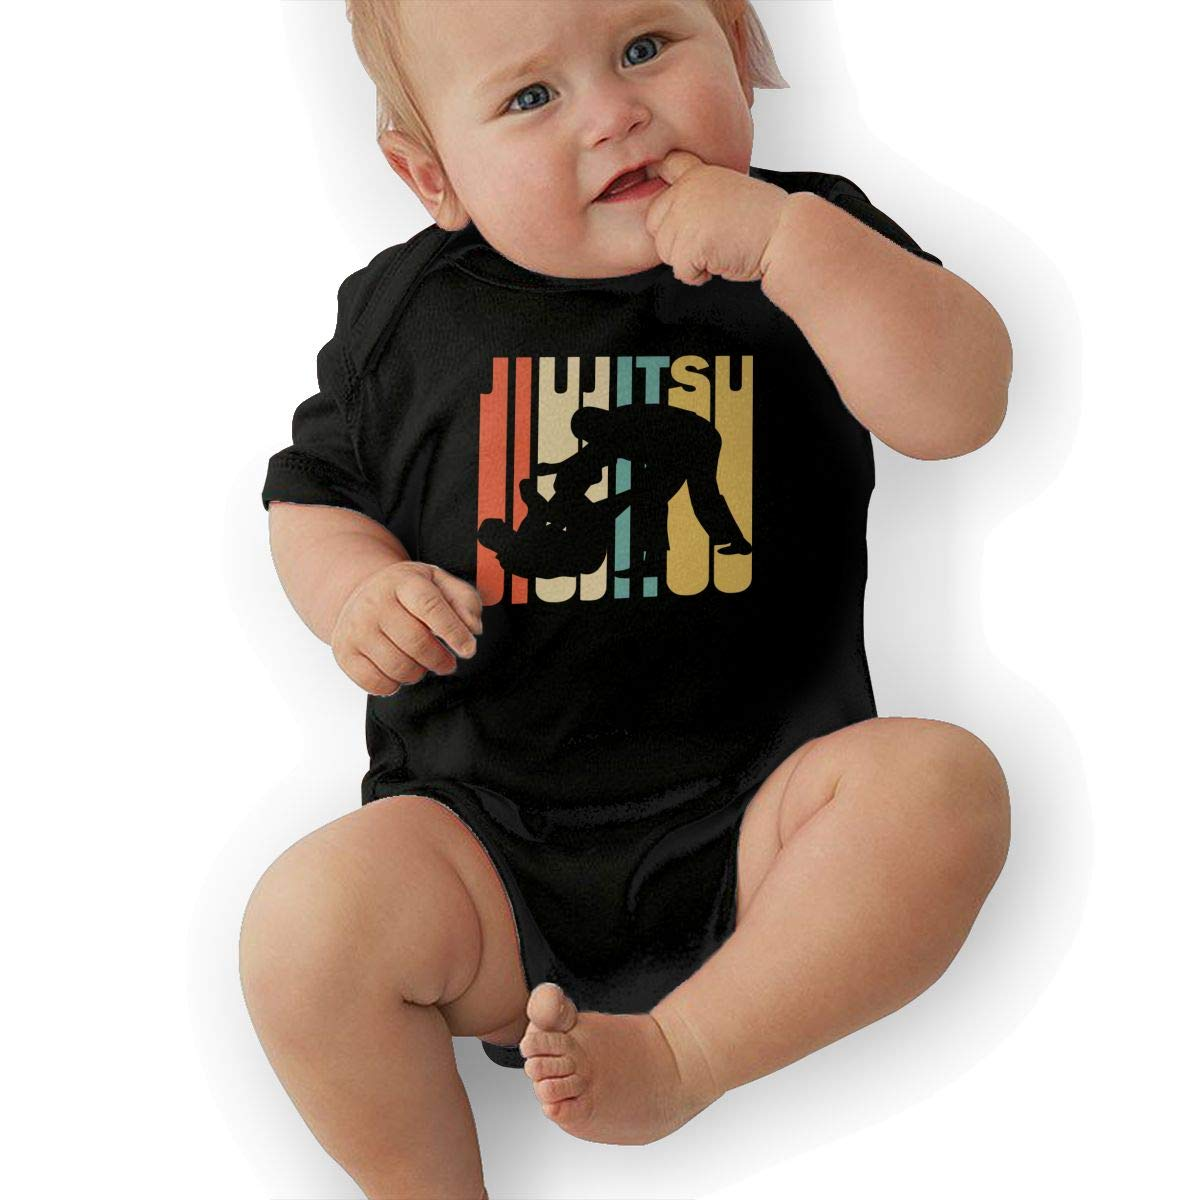 Soft Retro Style Jiu Jitsu Silhouette Jumpsuit Short Sleeve Cotton Bodysuit for Unisex Baby